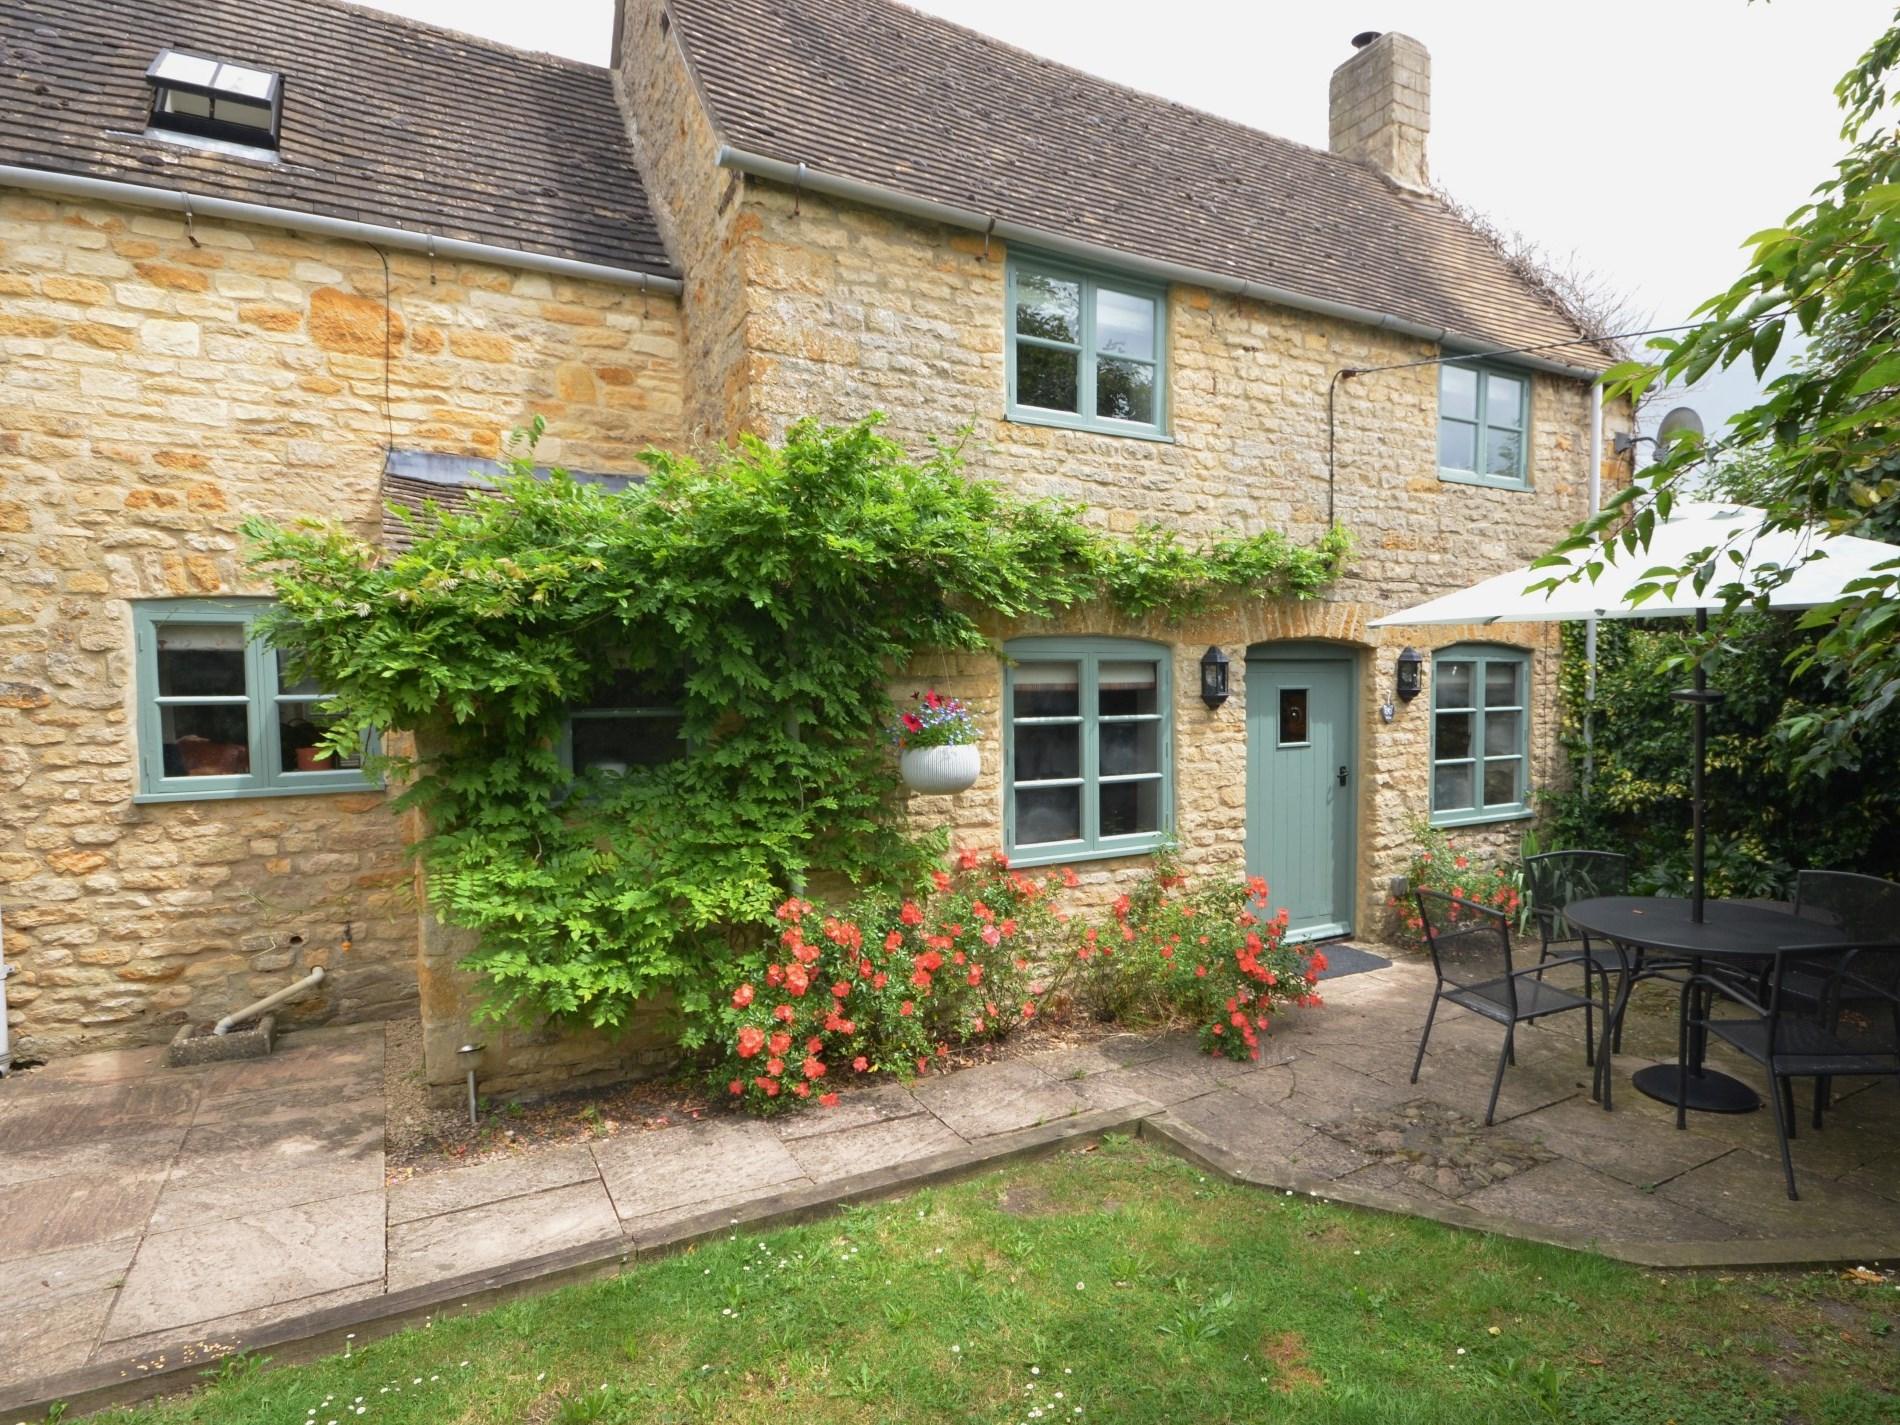 1 Bedroom Cottage in Cheltenham, Heart of England